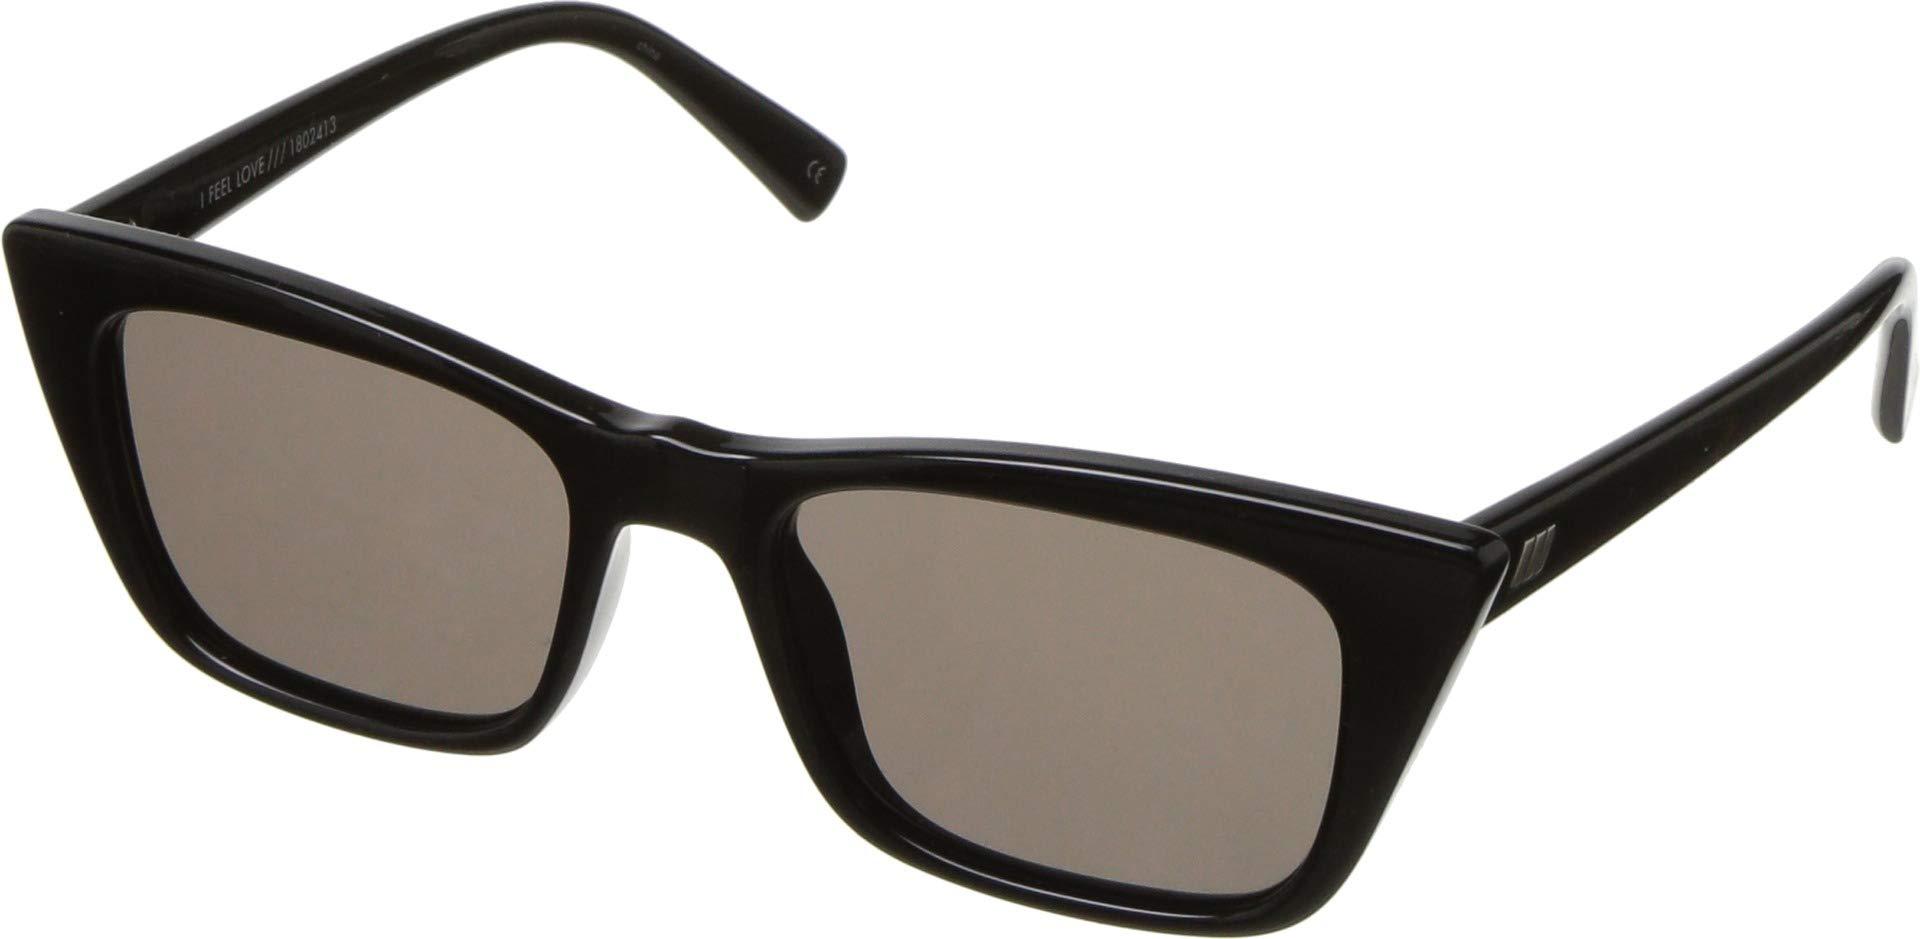 Le Specs Women's I Feel Love Sunglasses, Black/Black, One Size